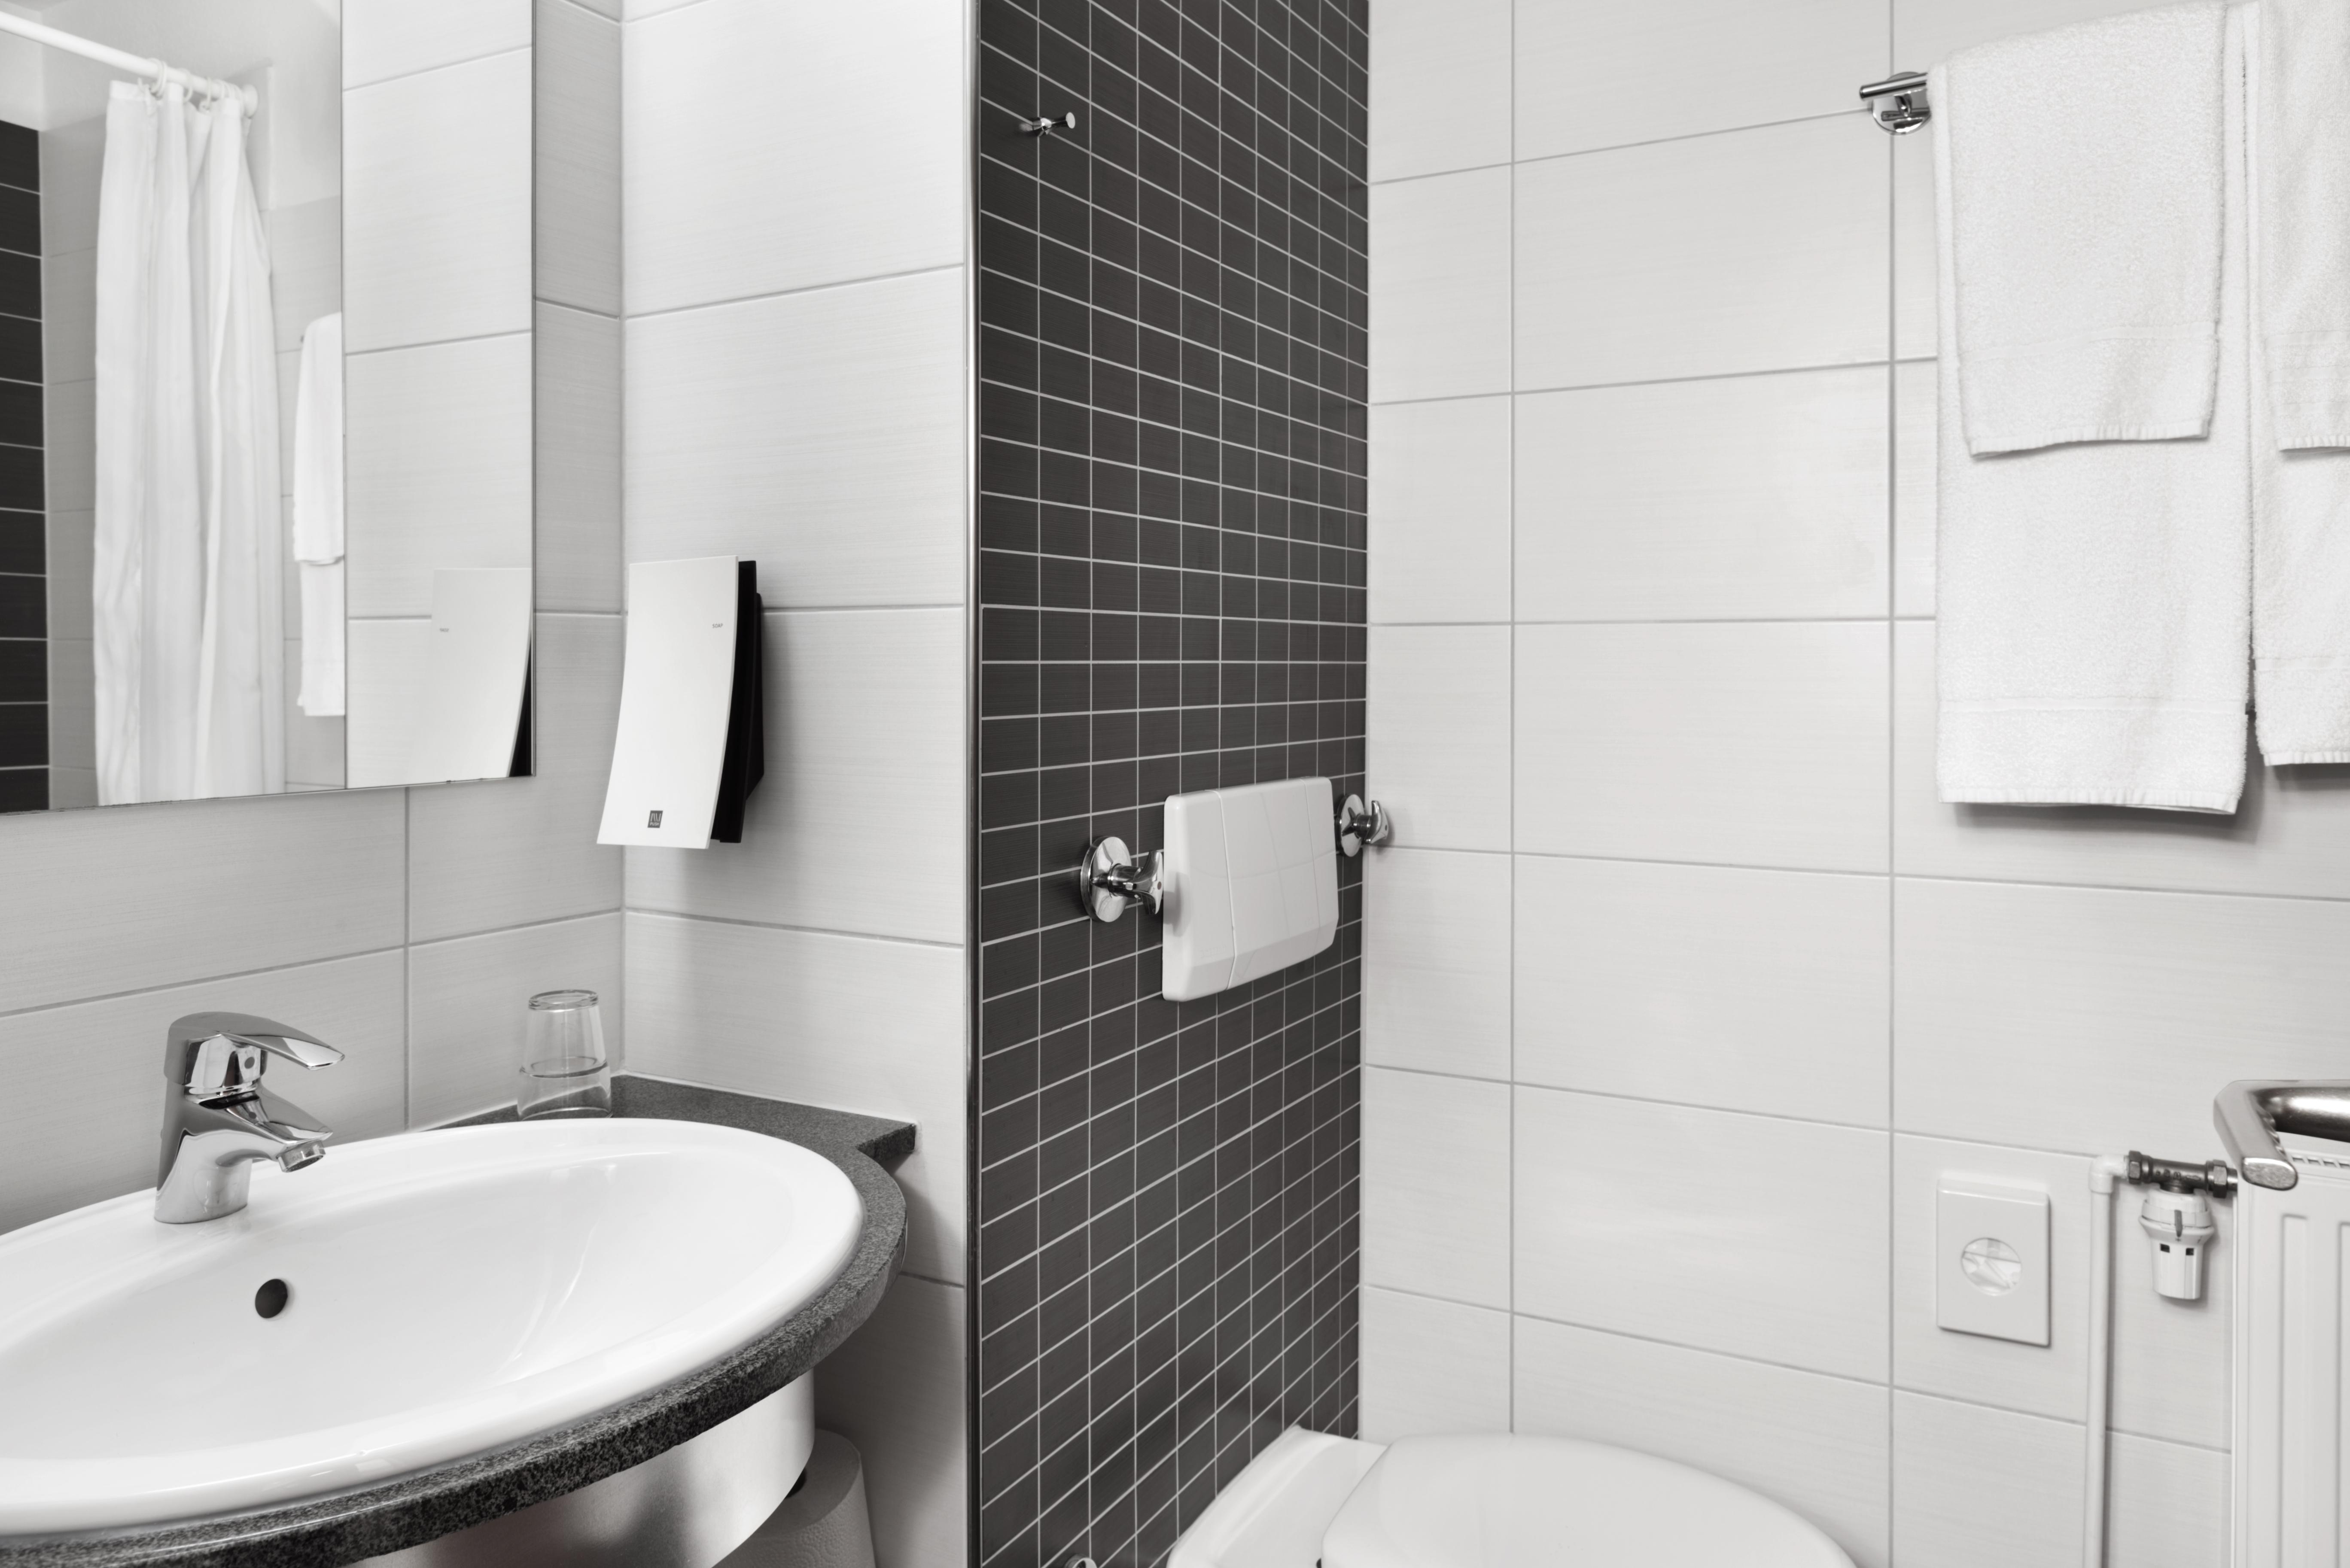 ... DZ Hotel Zimmer Badezimmer Bath Room TRYP By Wyndham Lübeck Hotel | ©  TRYP By Wyndham ...